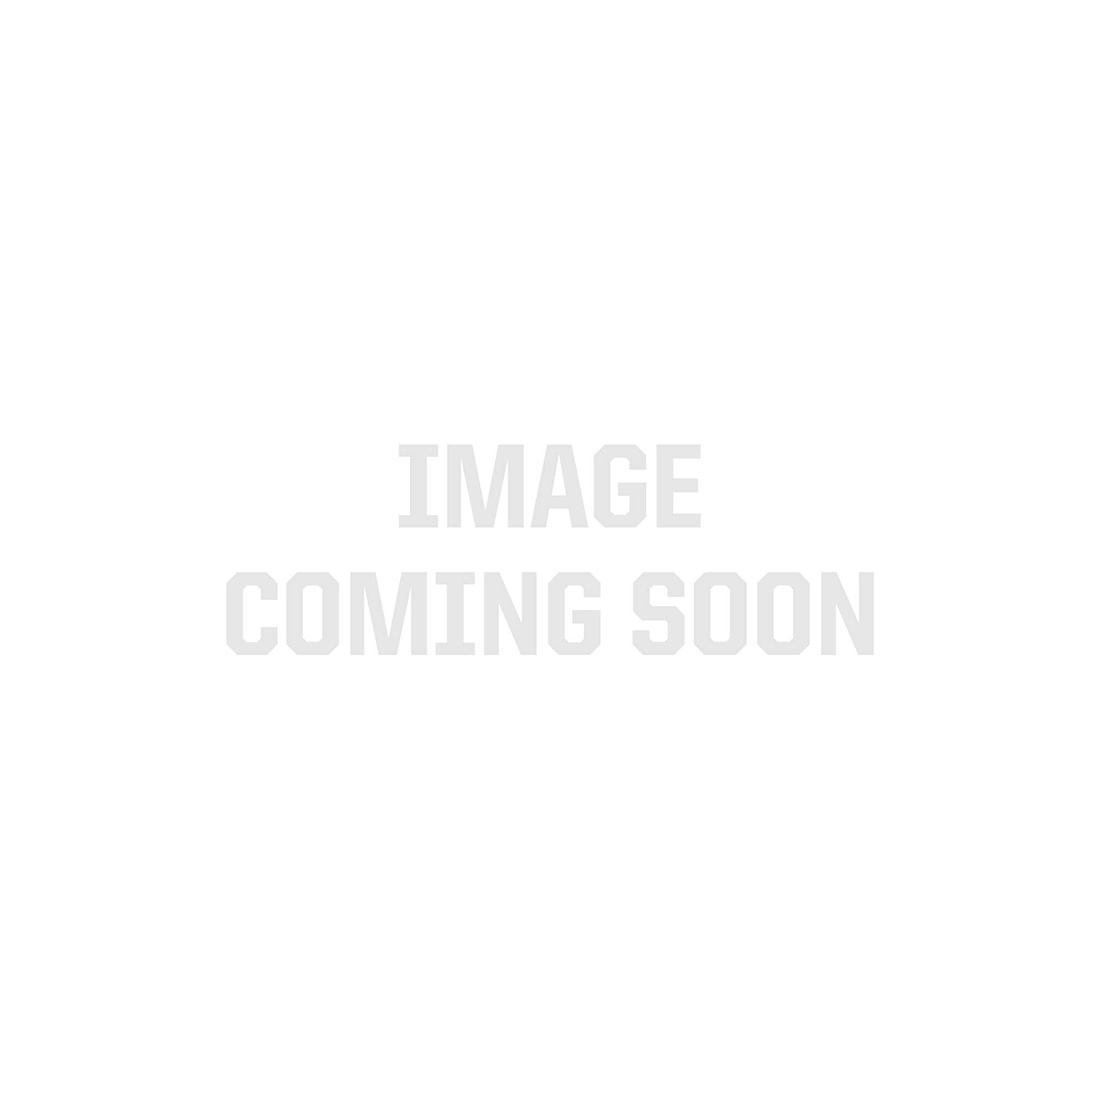 Waterproof Green 3528 Quad Row LED Strip Light, 450/m, 28mm wide, Sample Kit